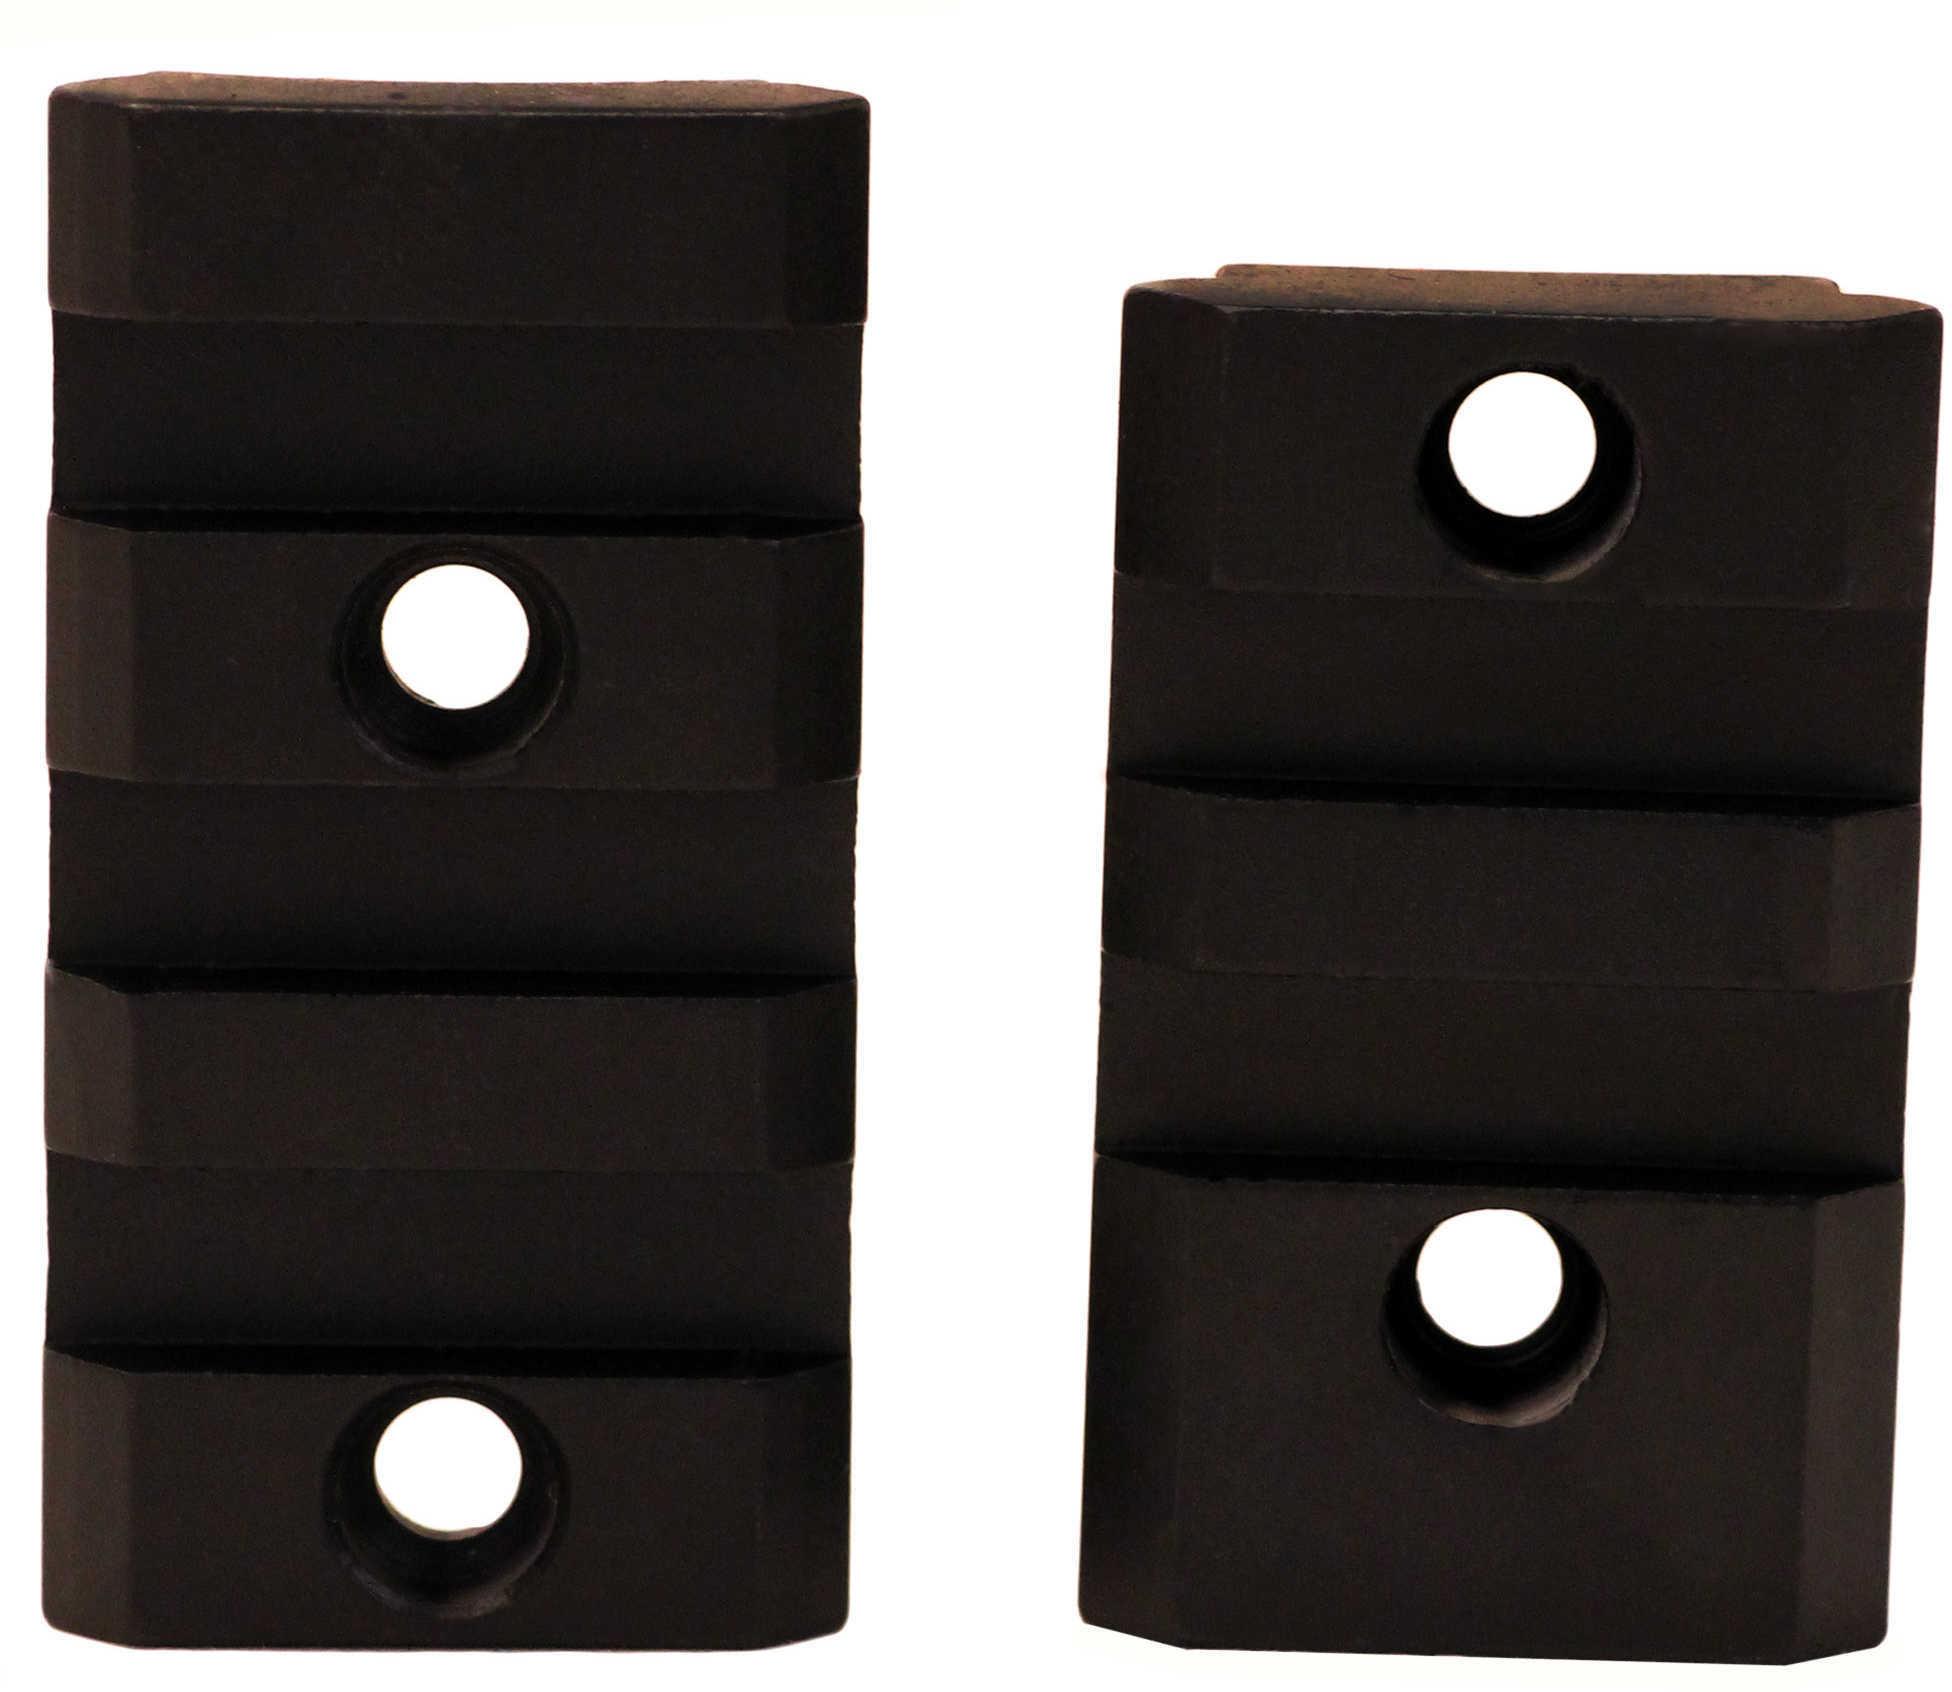 Burris XTB Weaver-Style Solid Steel Bases Savage Flat, 2 Piece, Matte Black Md: 410620